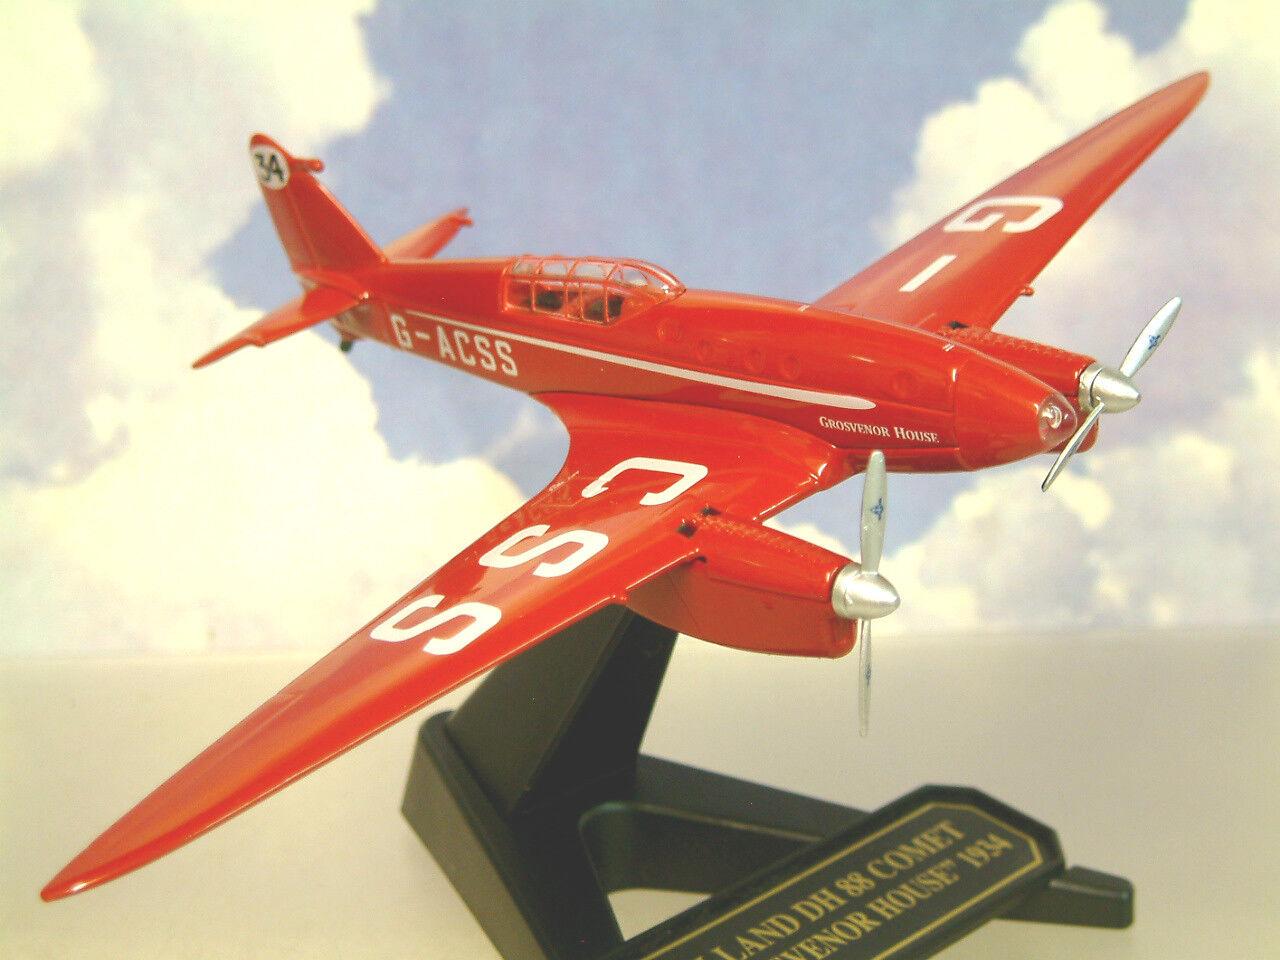 OXFORD 1 72 DeHAVILLAND DH88 COMET G-ACSS GROSVENOR HOUSE 1934 AIR RACE 72COM002